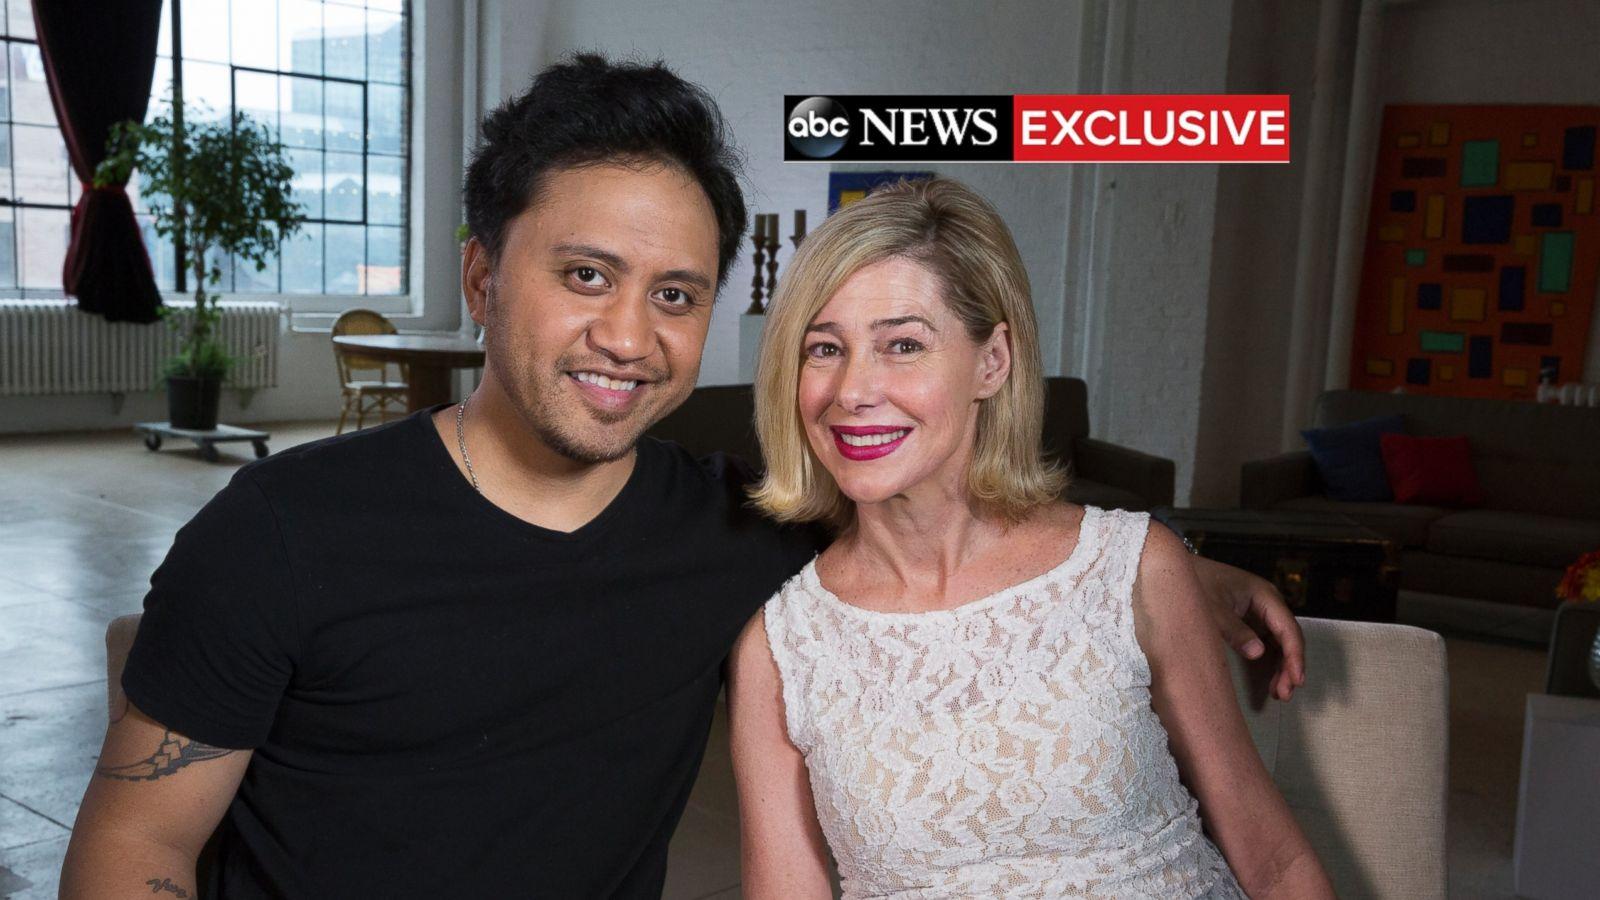 Mary Kay Letourneau Fualaau, Vili Fualaau Detail Their Path From Teacher-Student  Sex Scandal to Raising Teenagers - ABC News